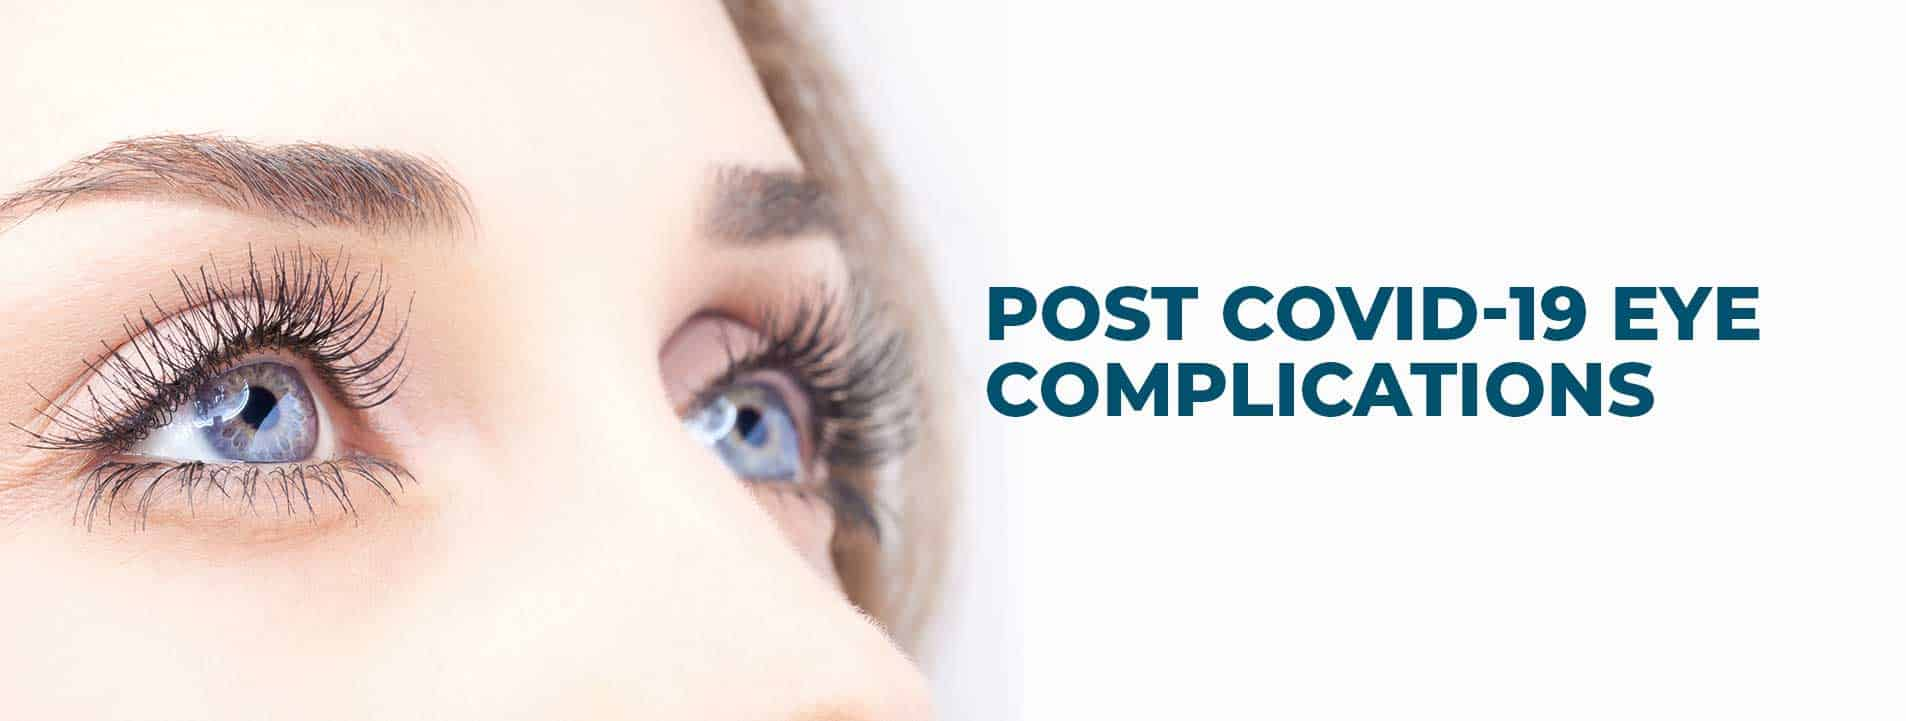 Post Covid 19 Eye Complications